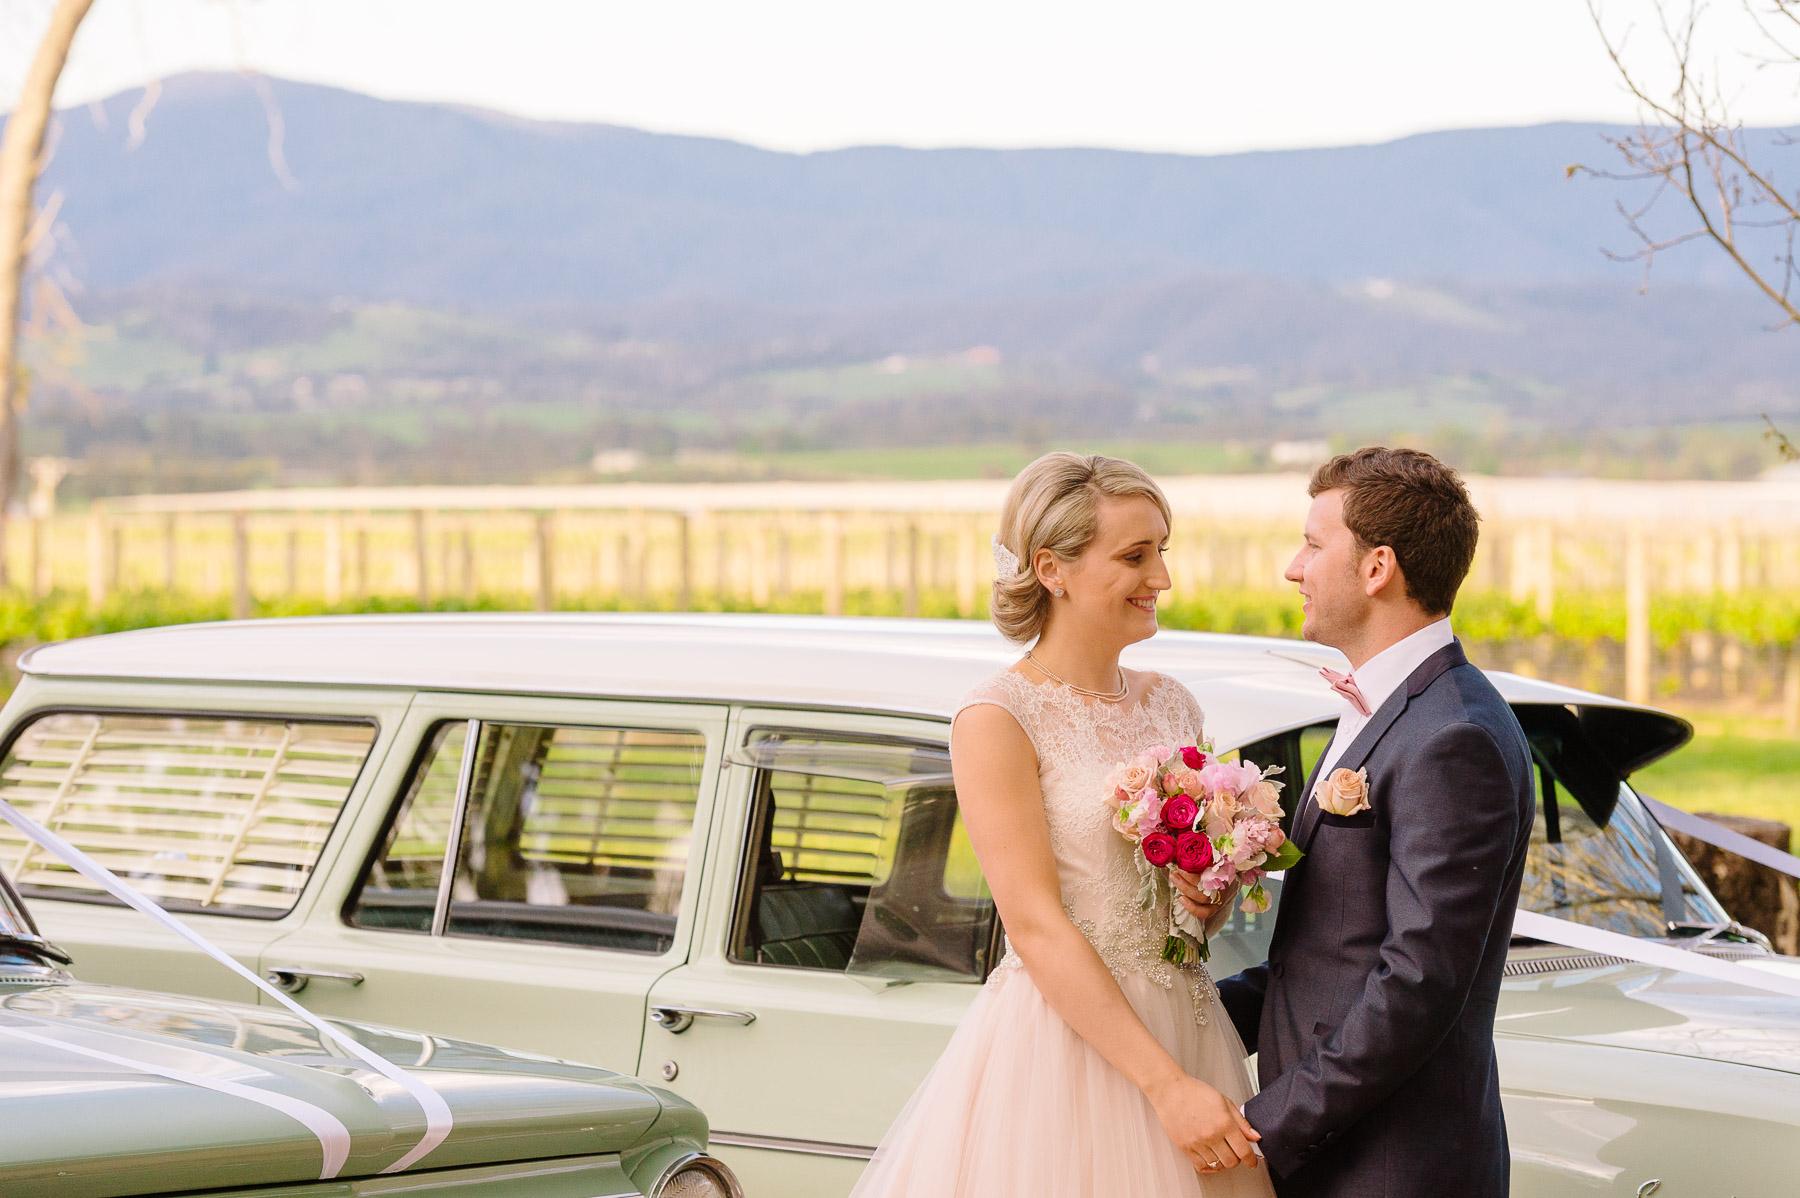 Marnie_and_Charlie_Yarra_Valley_Wedding_Blog-68.jpg